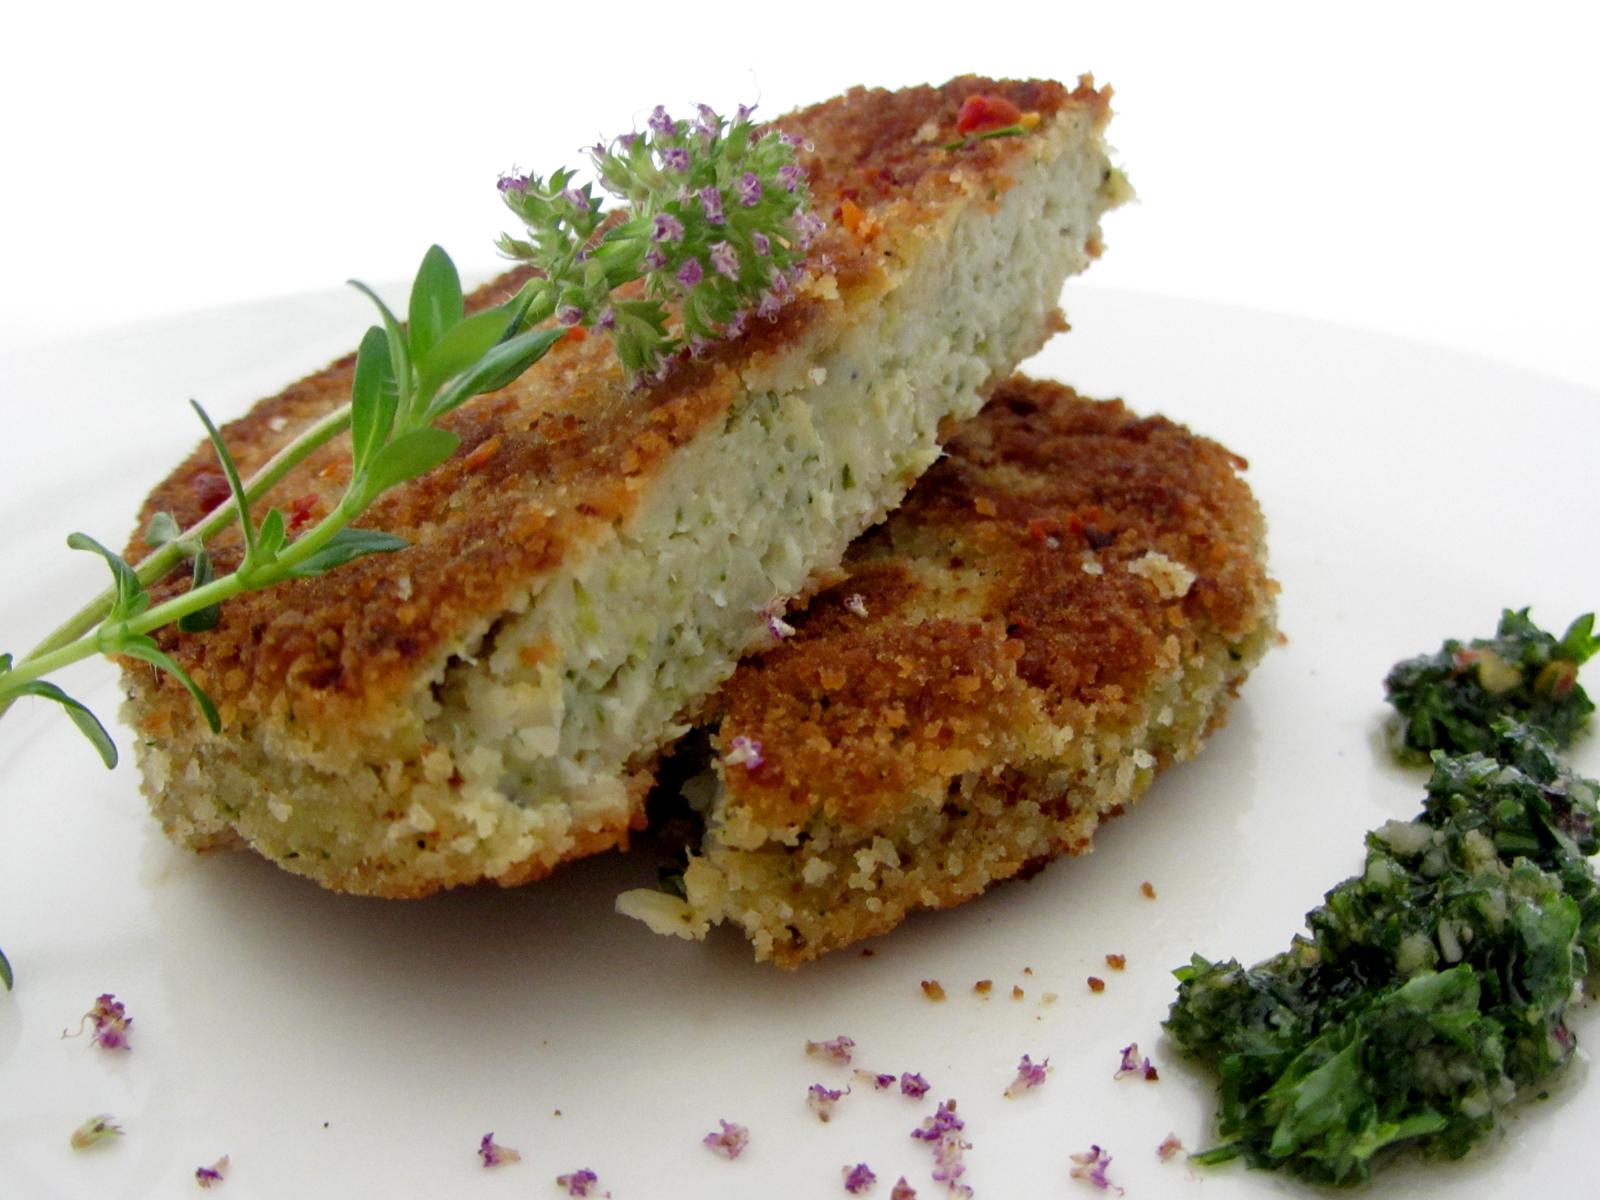 fell in love with gemuese vegane rezepte zum verlieben blumenkohl broccoli schnitzel. Black Bedroom Furniture Sets. Home Design Ideas